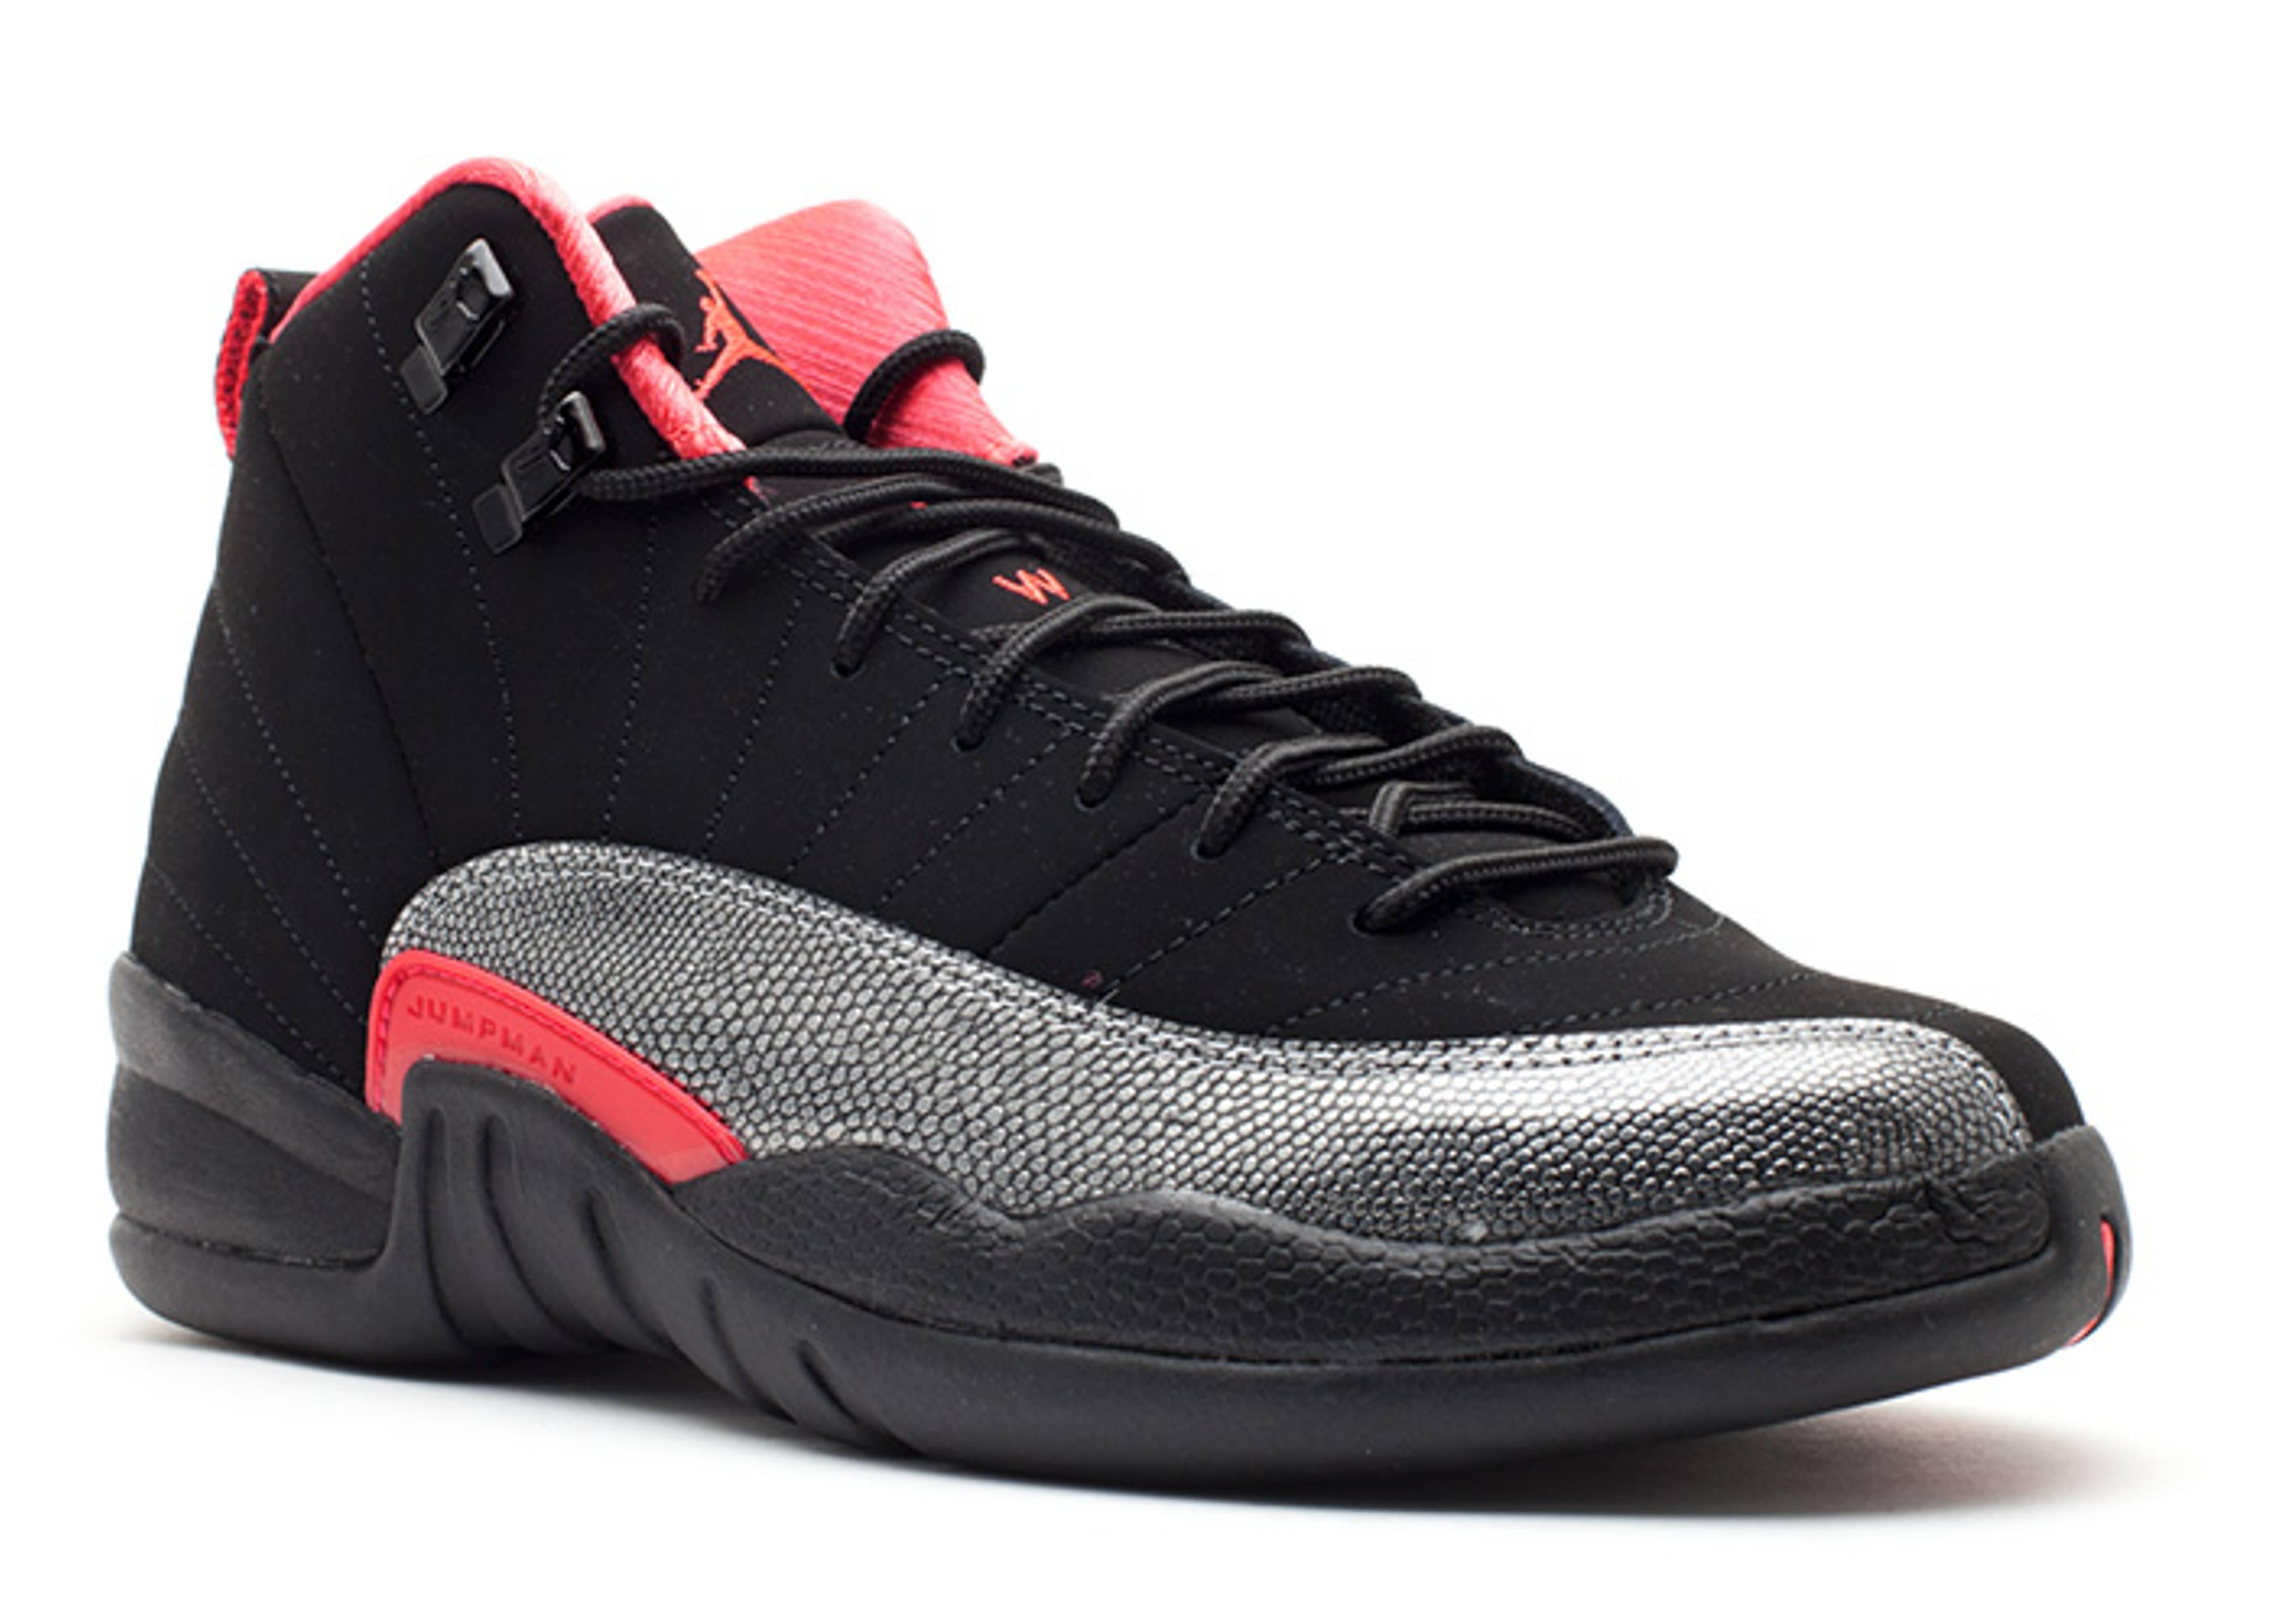 Fast Shipping Nike Air Jordan 12 Retro Cheap sale Siren Red Blac ... 605ecaa07